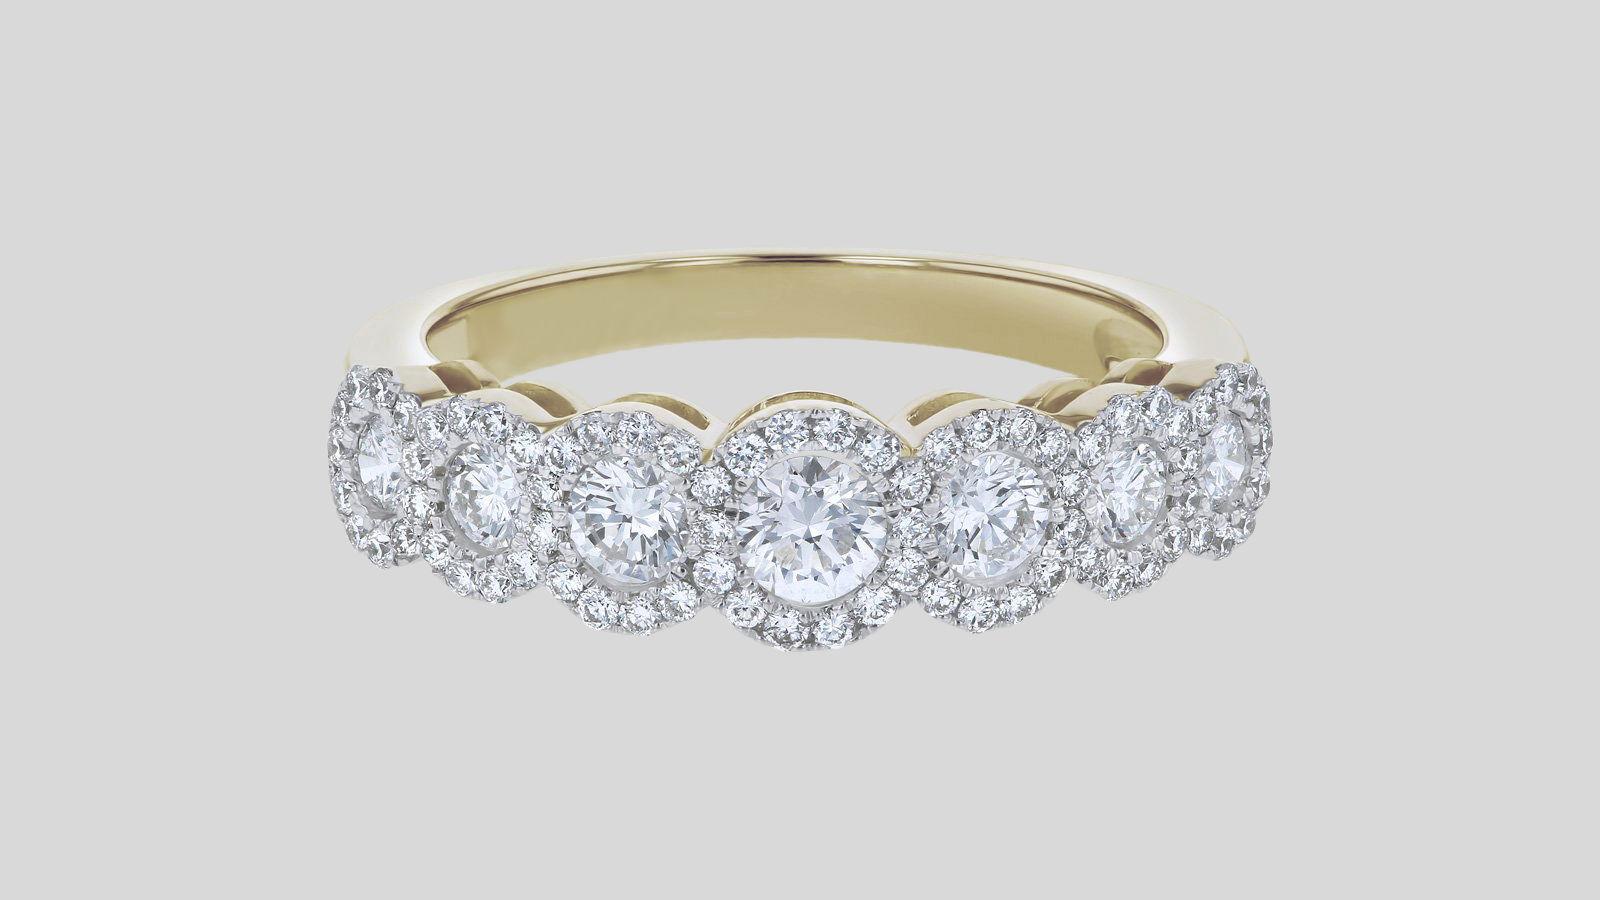 The Round Diamond Halo Half Band Ring